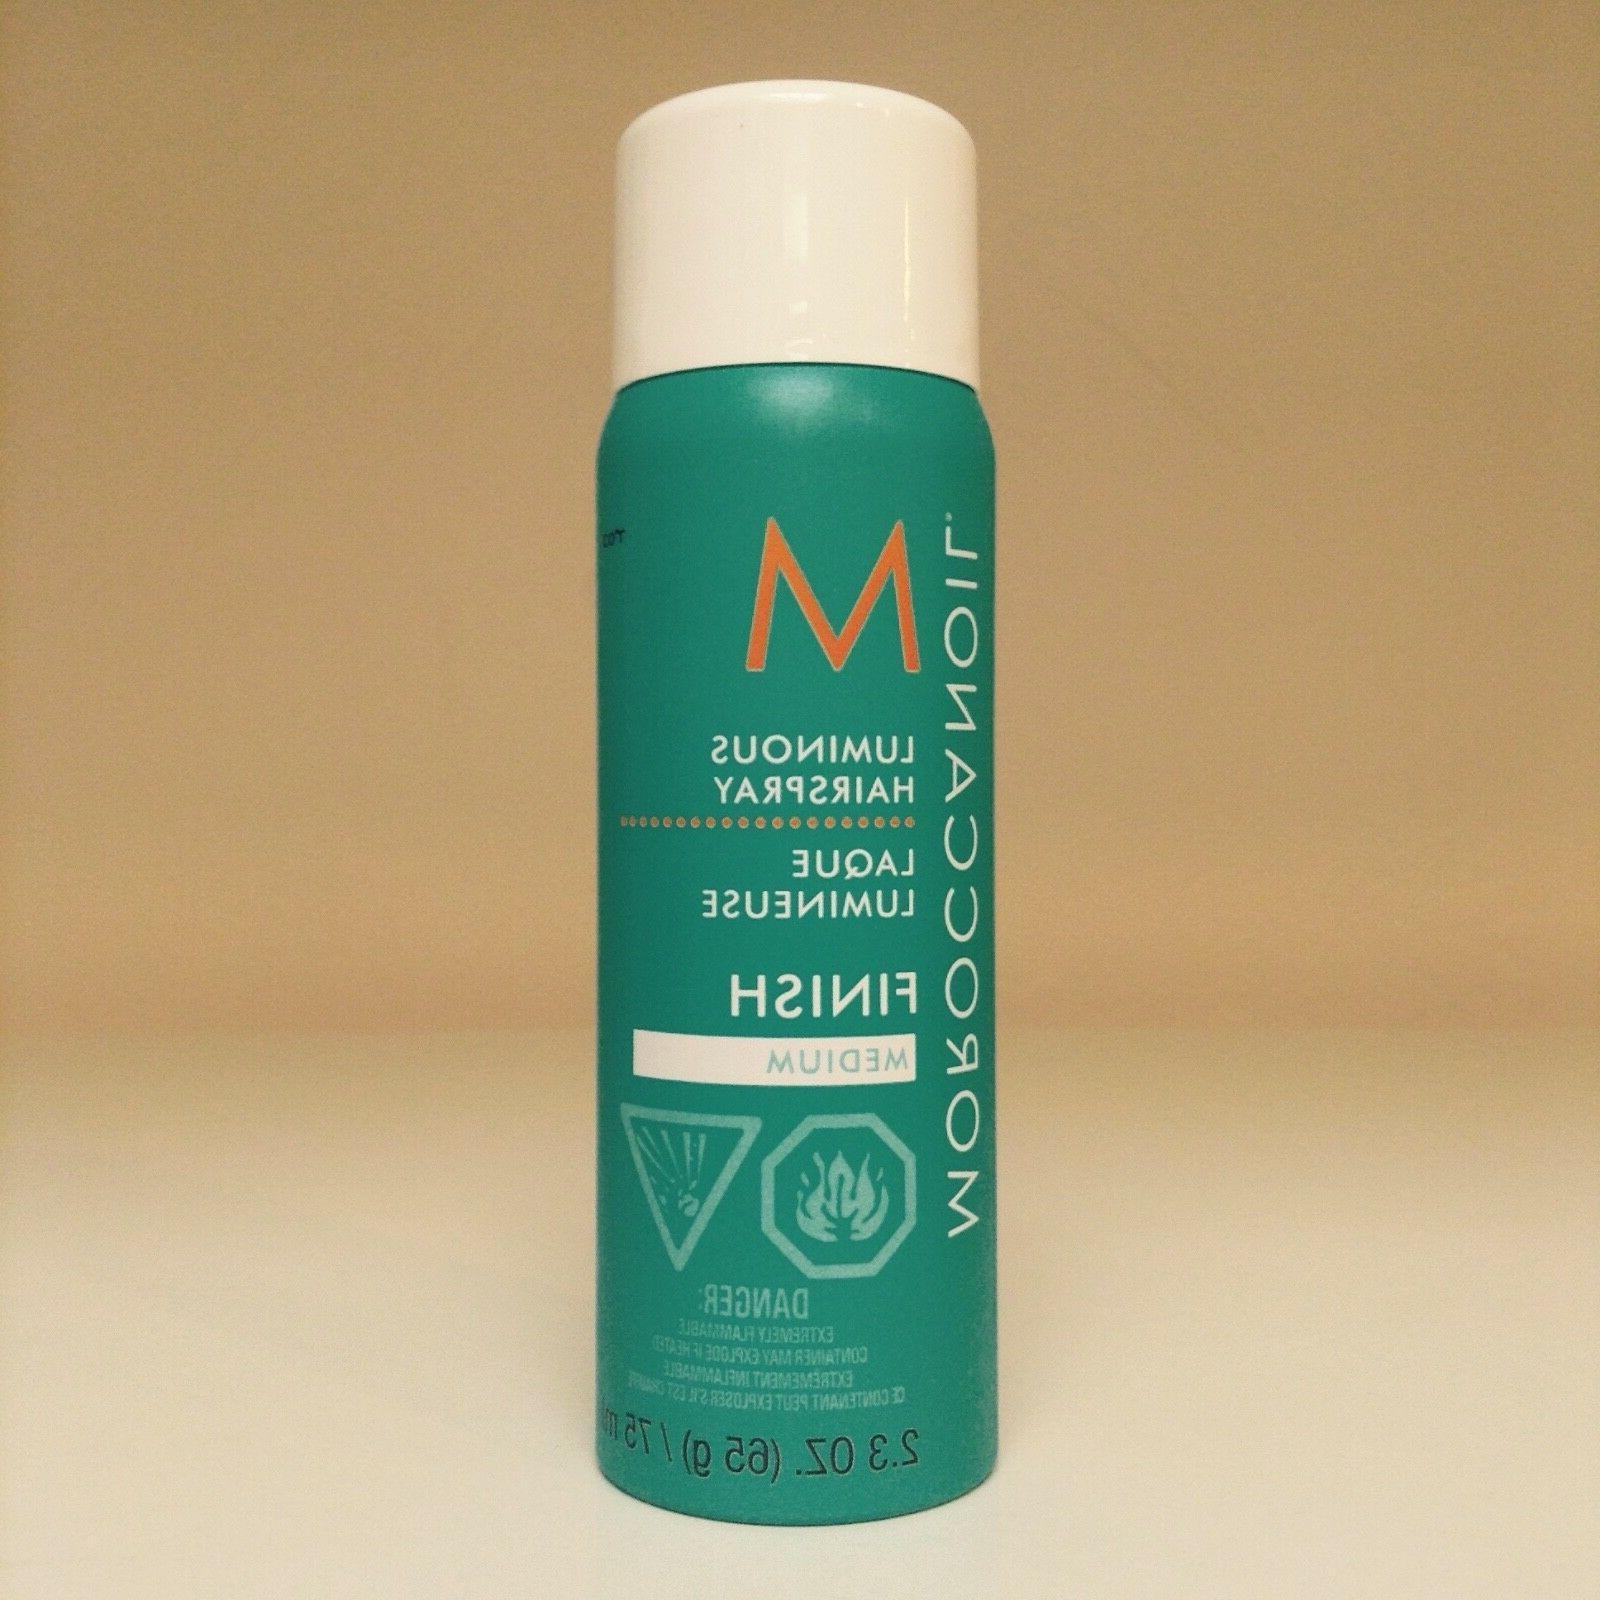 Moroccanoil Finish Luminous Hairspray MEDIUM ~ Travel Size 2